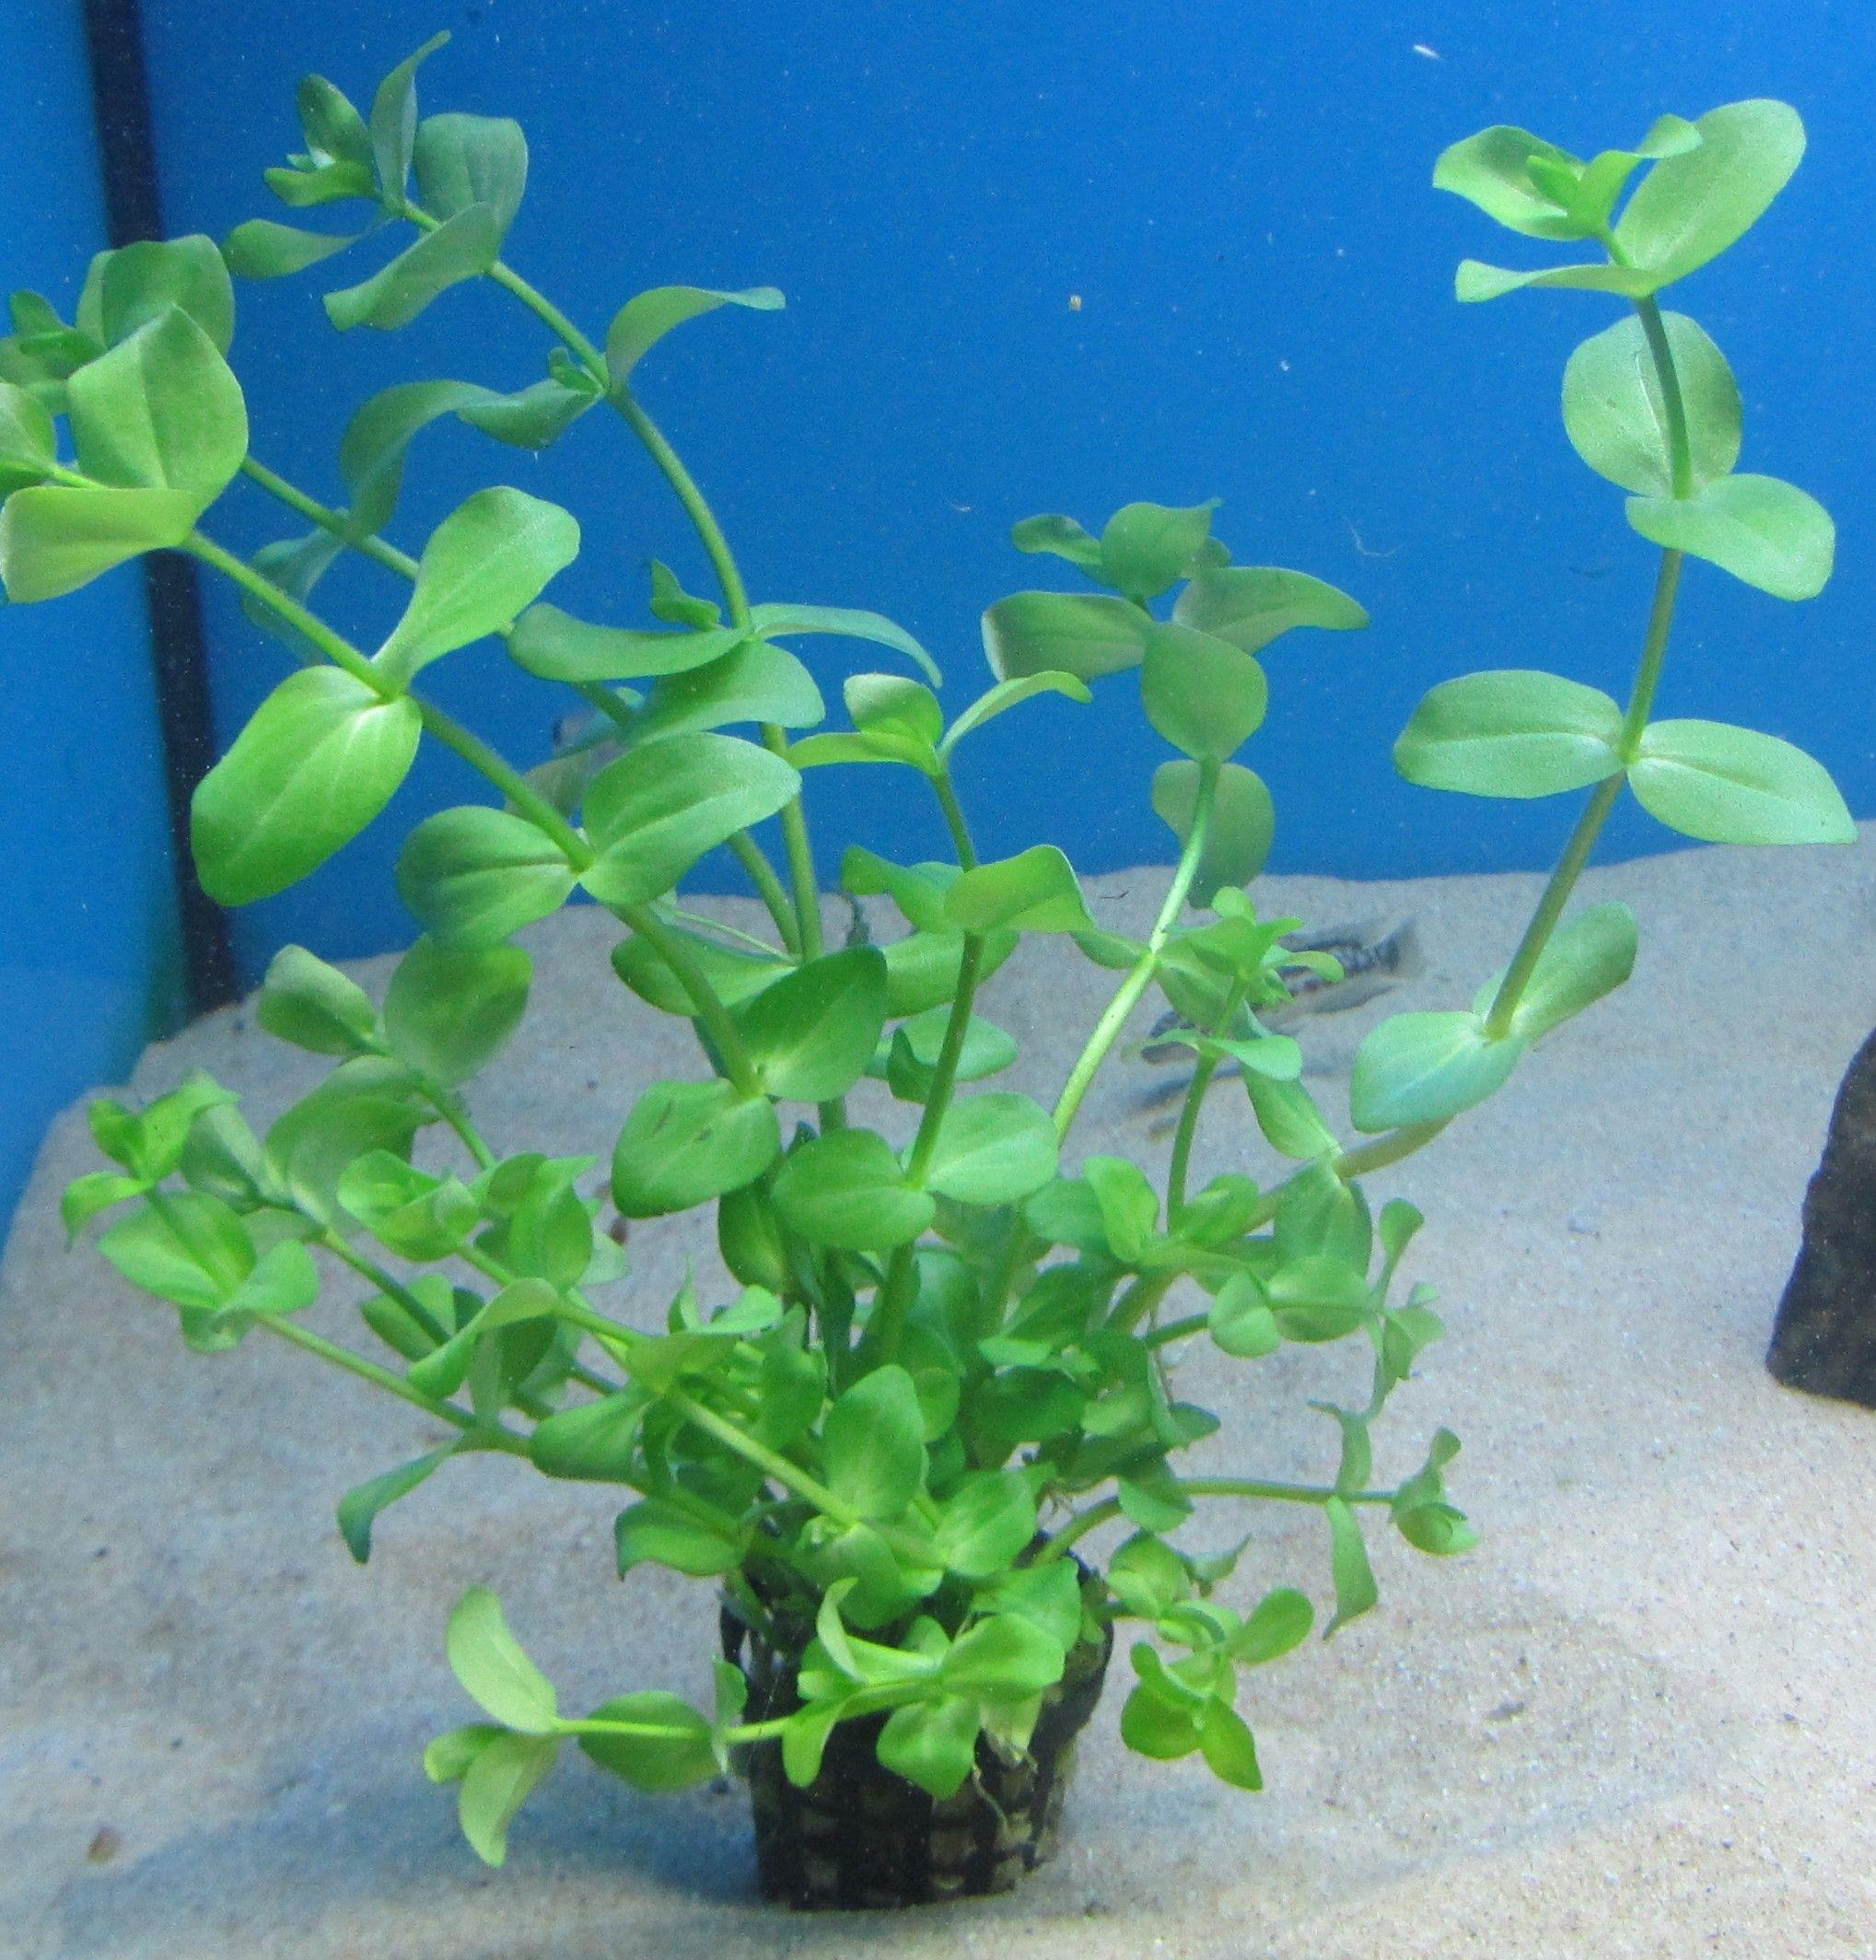 Bacopa caroliniana / amplexicaulis